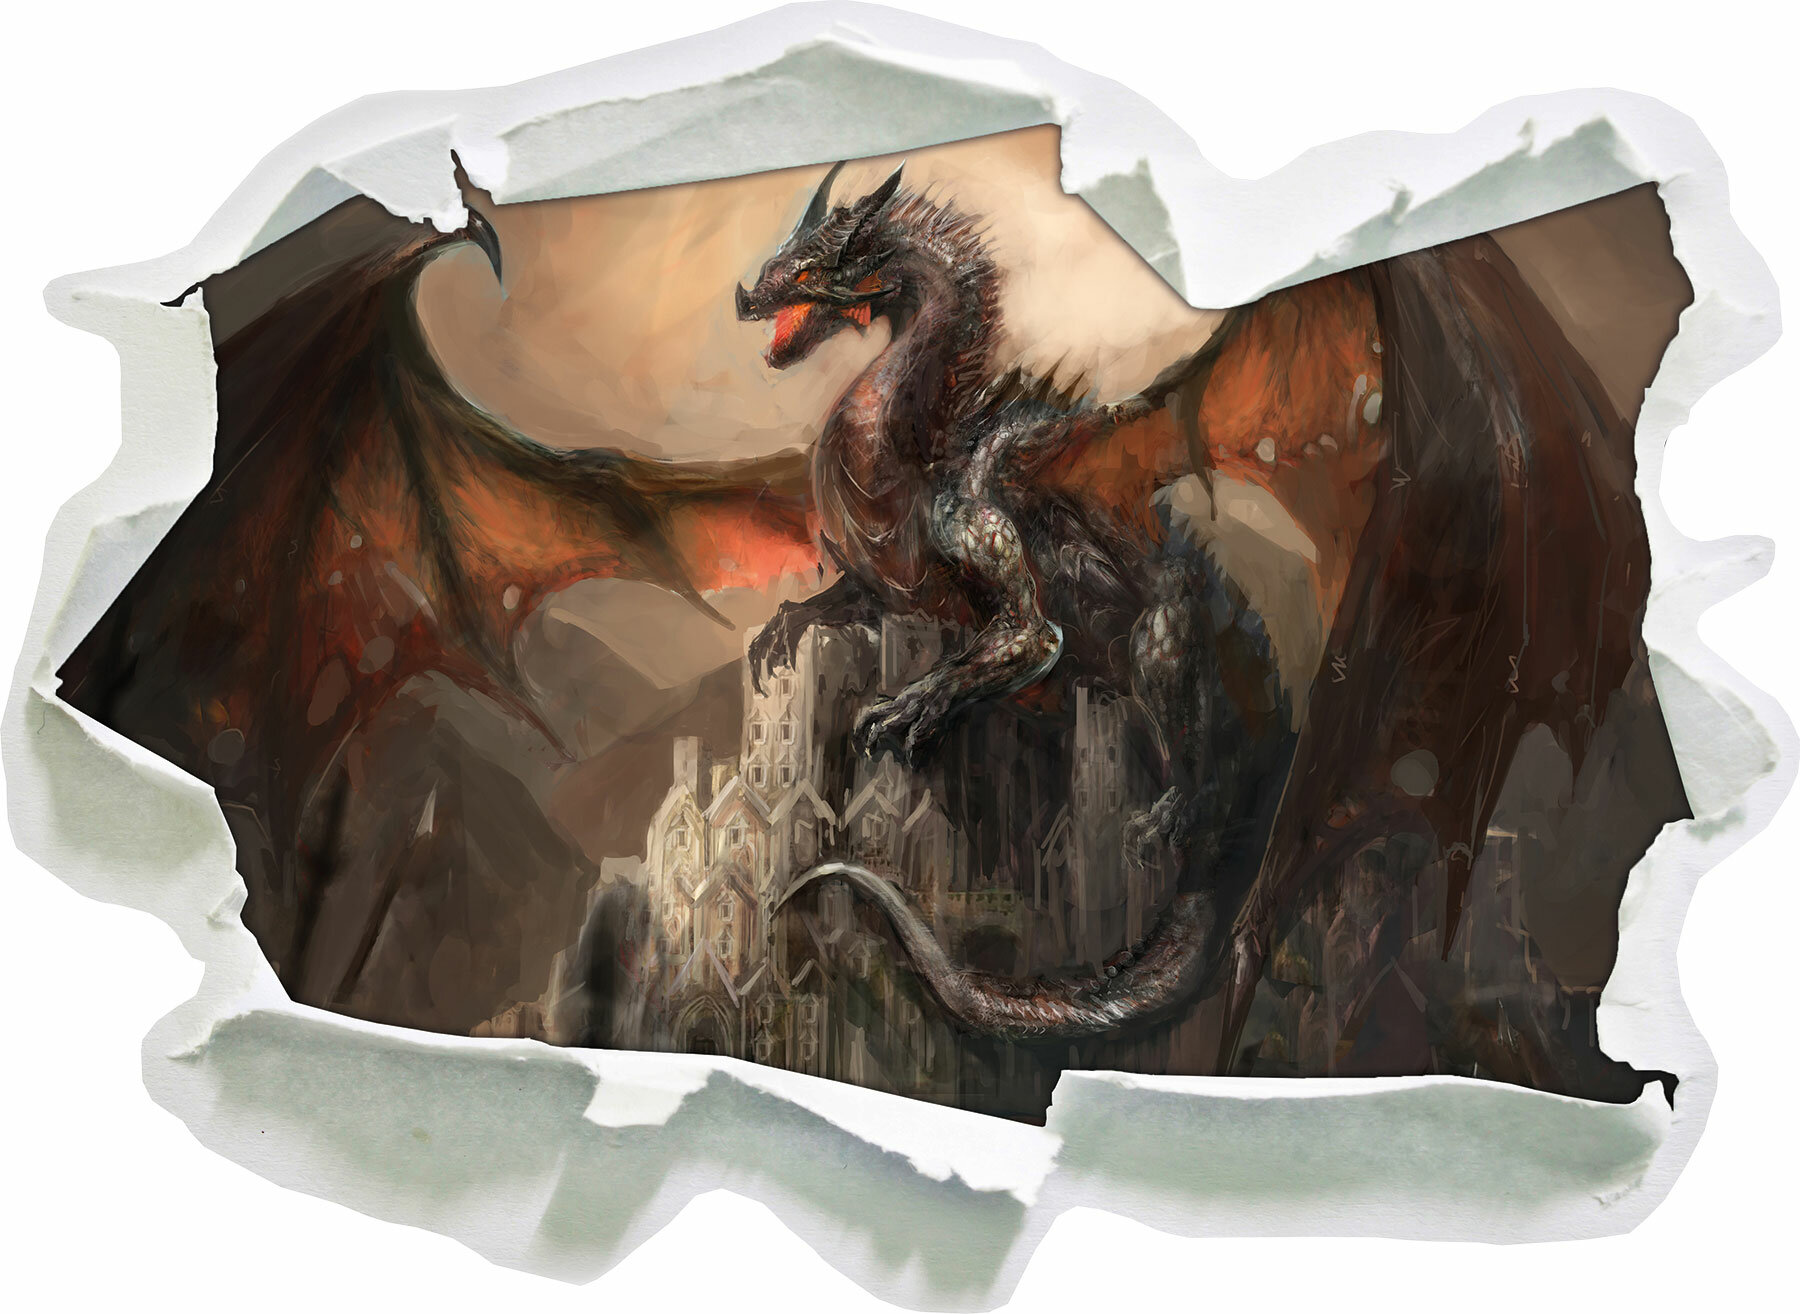 Wandtattoo Drache Dragon 01 Wandaufkleber Wandsticker Wandbild Sticker